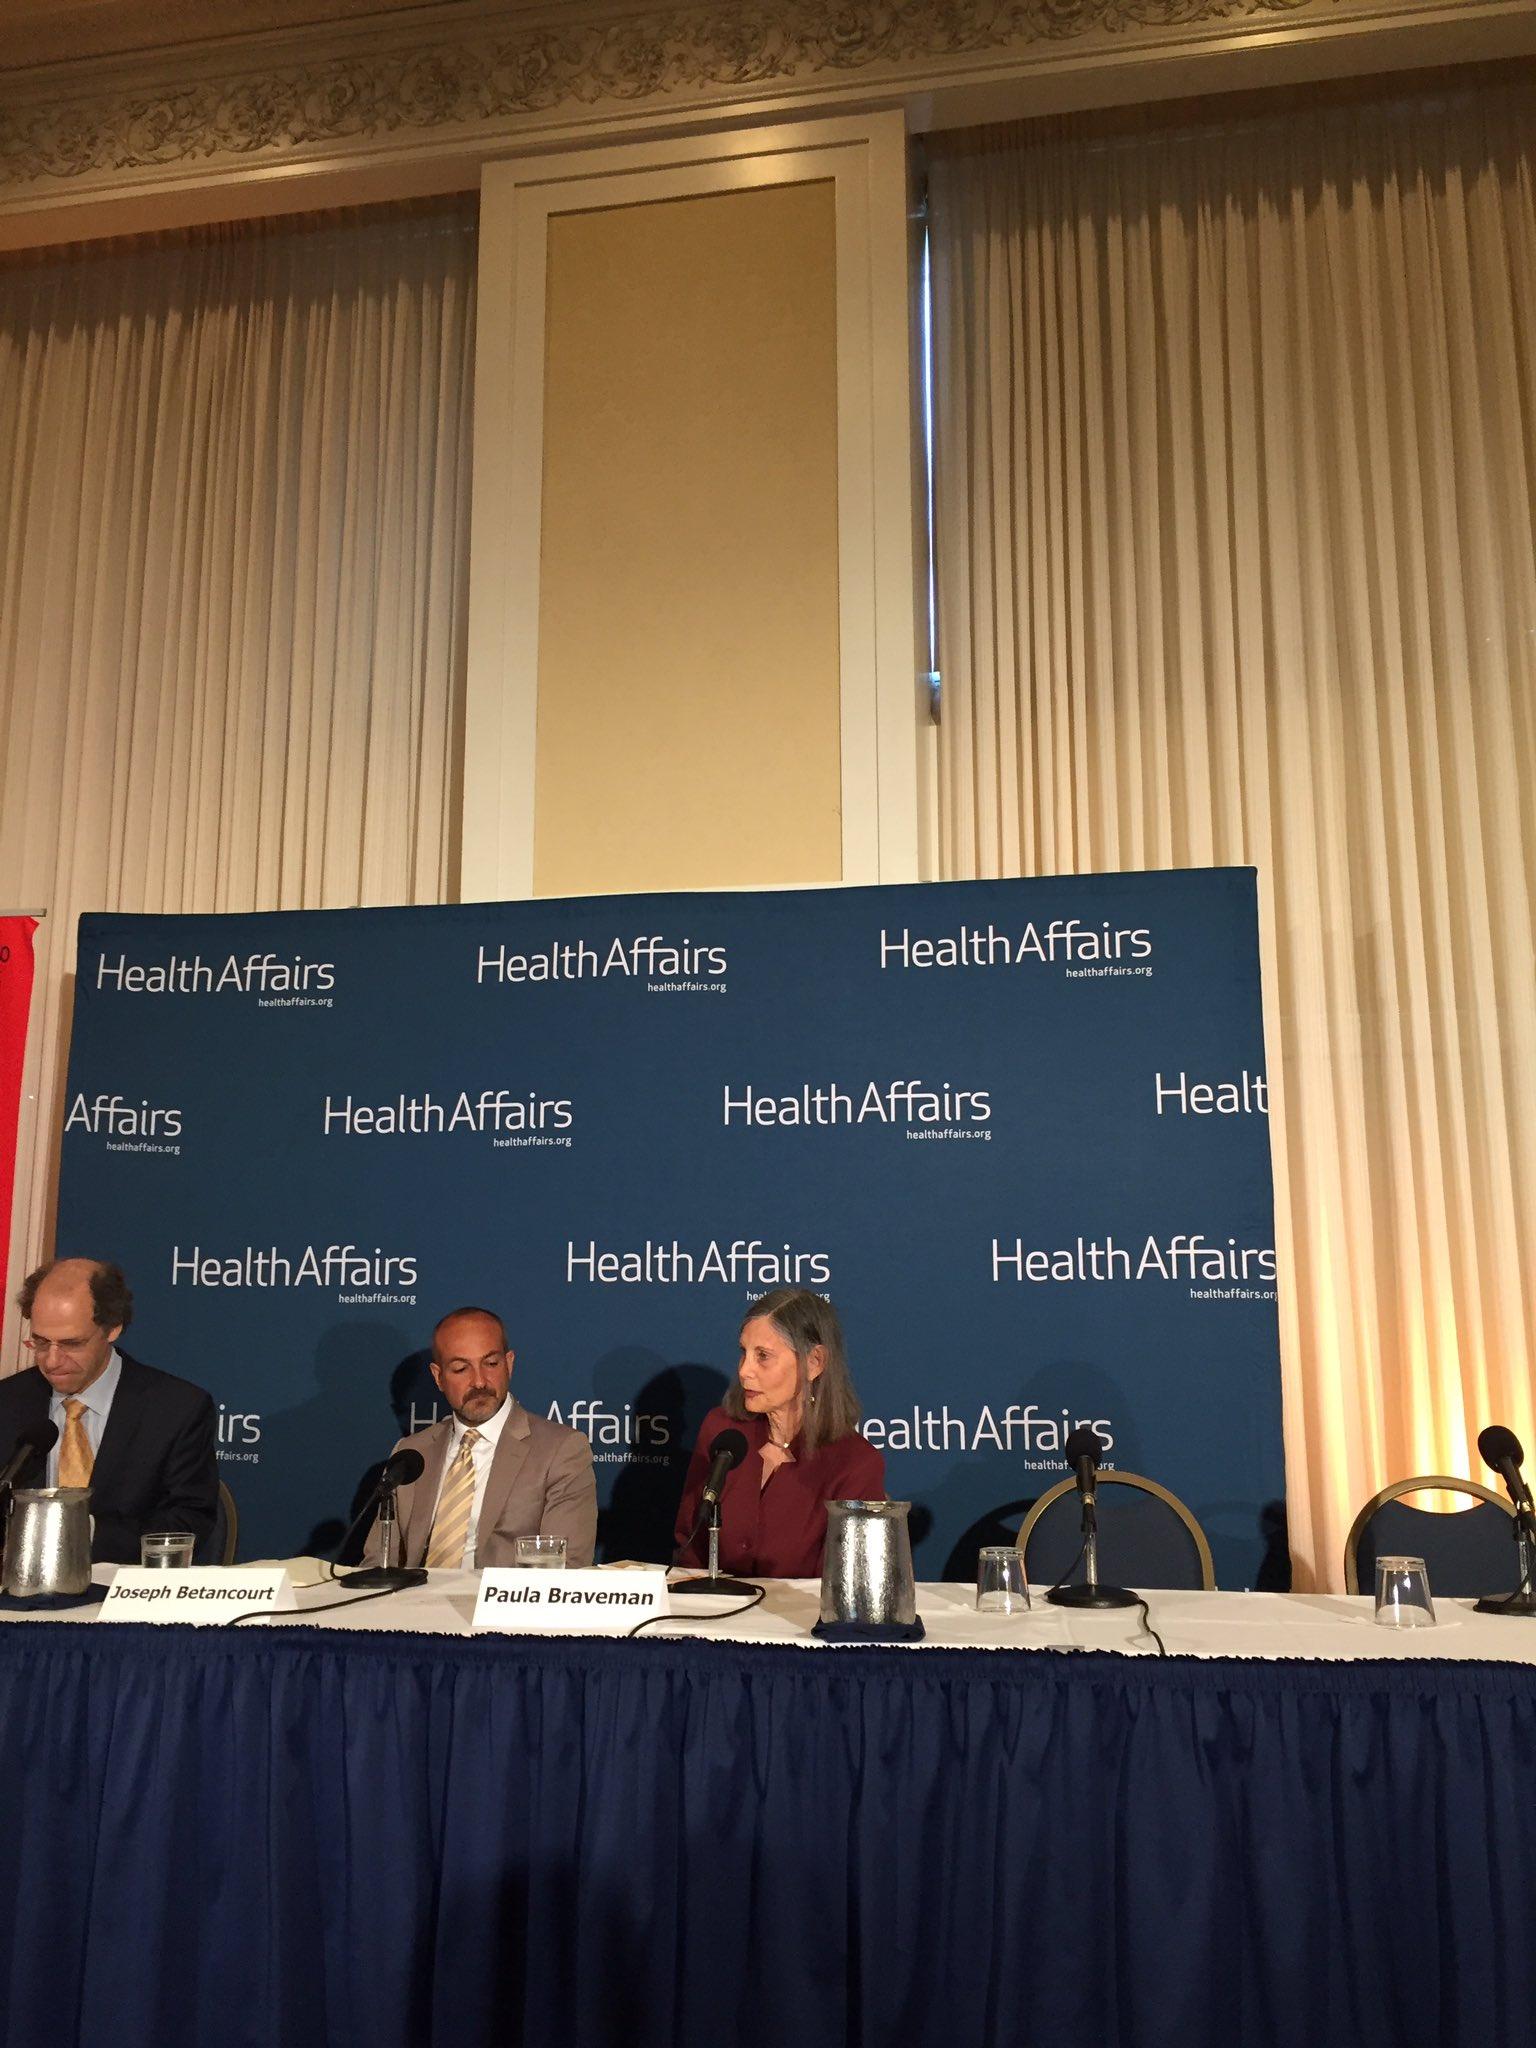 """The #healthequity frame means moving beyond health care"" -Paula Braveman @Health_Affairs https://t.co/ZugluG9bQ3"